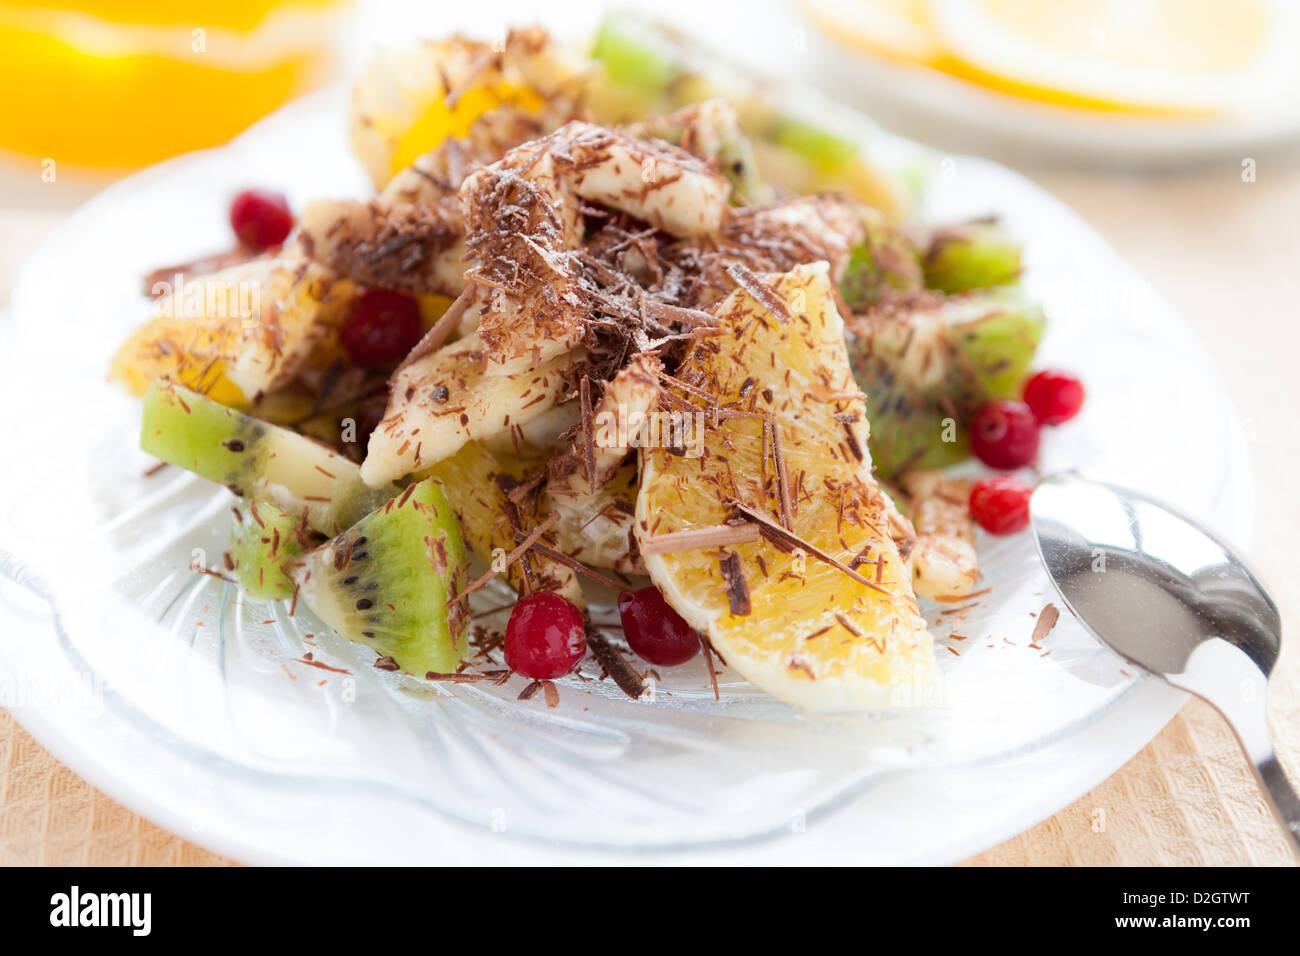 salad of kiwi and orange with chocolate, closeup - Stock Image